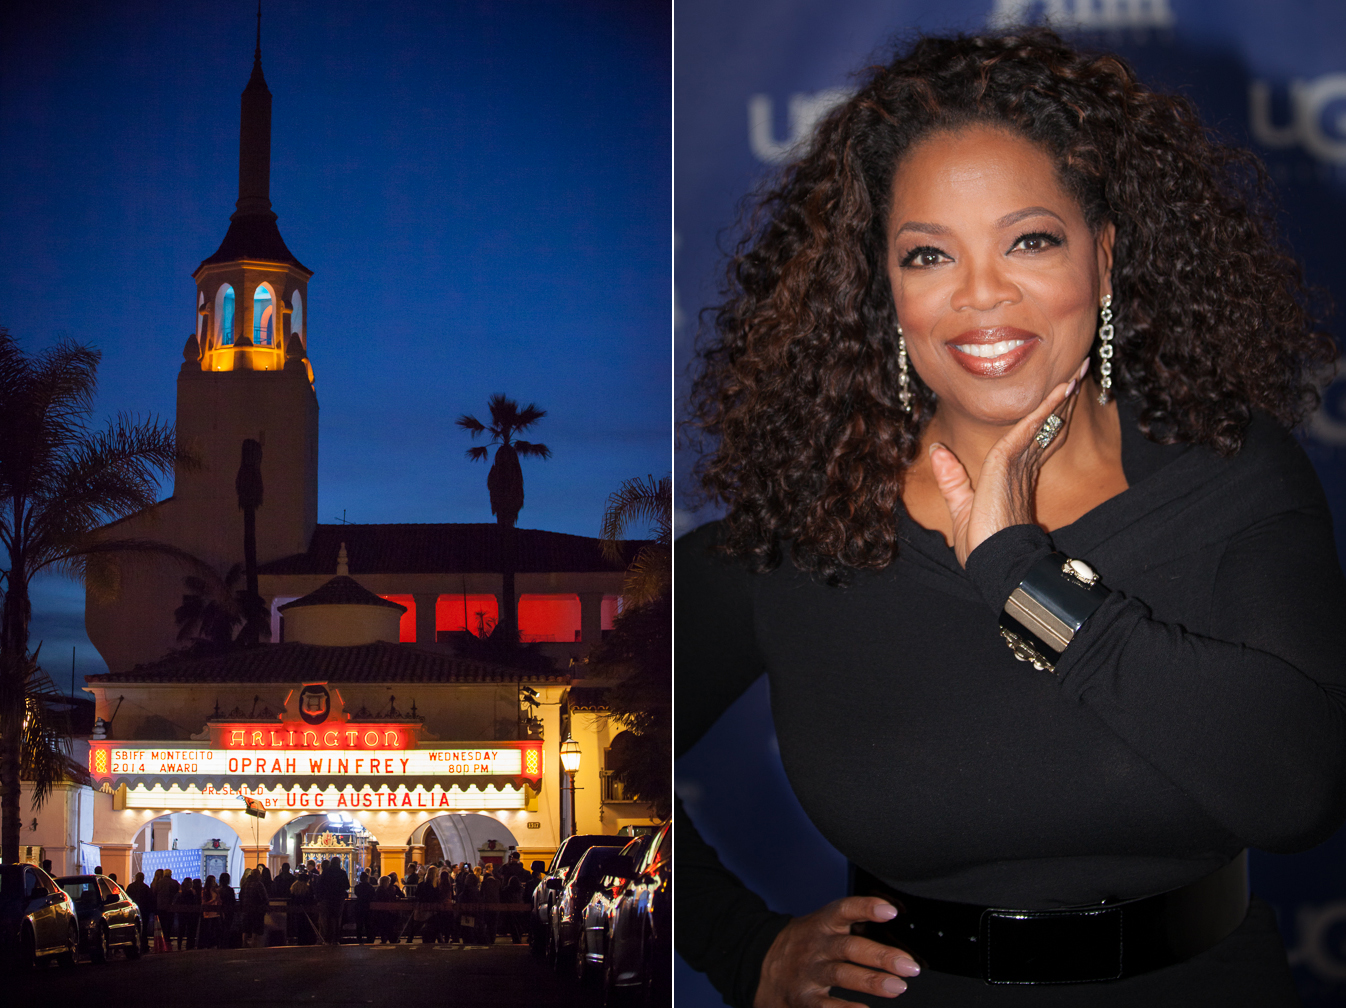 Oprah Award night at the Santa Barbara Film Festival